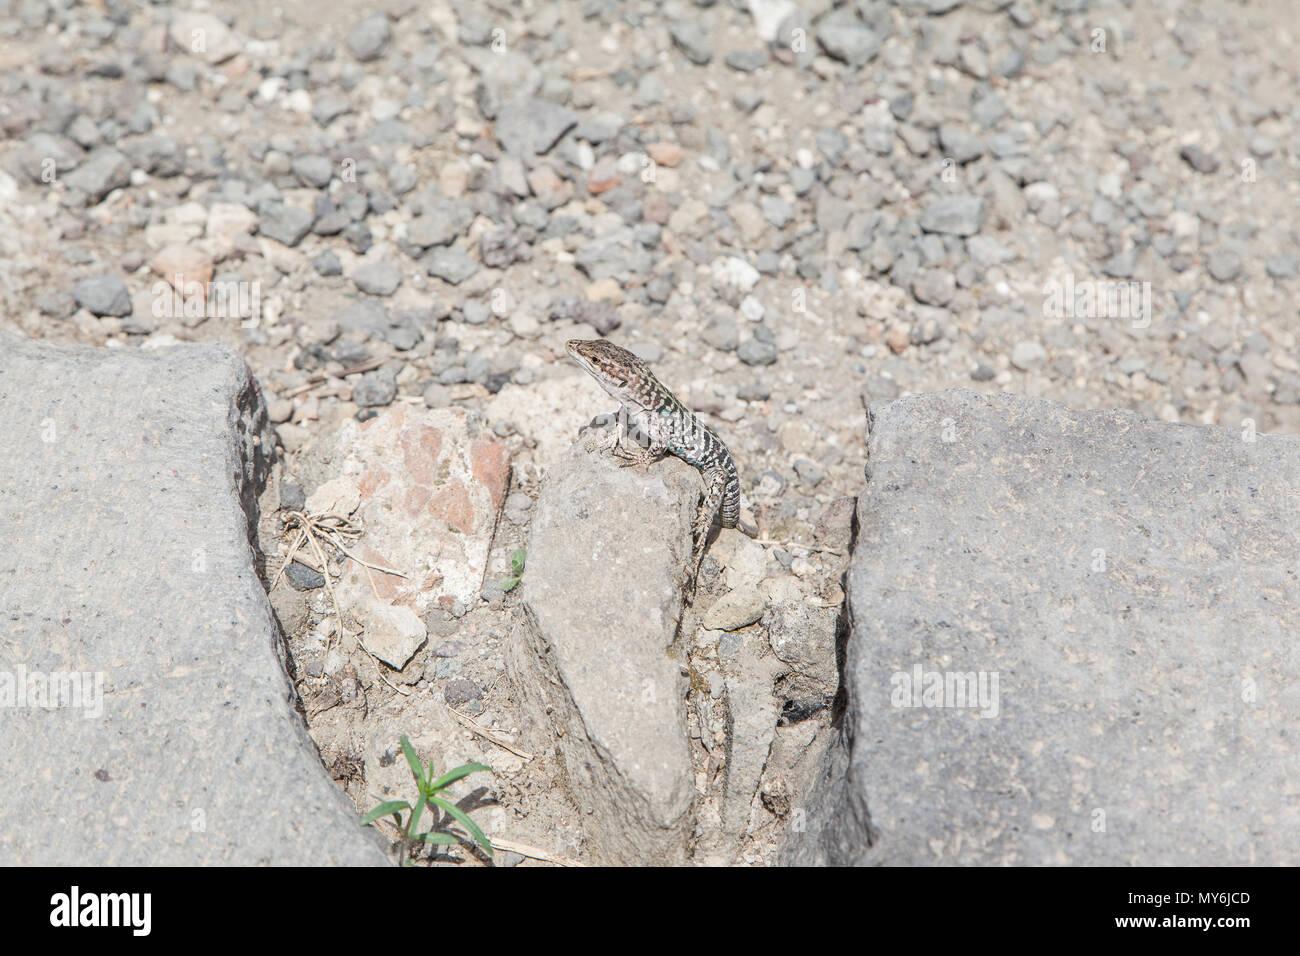 Eidechse nimmt Sonnenbad in Pompeji - Stock Image